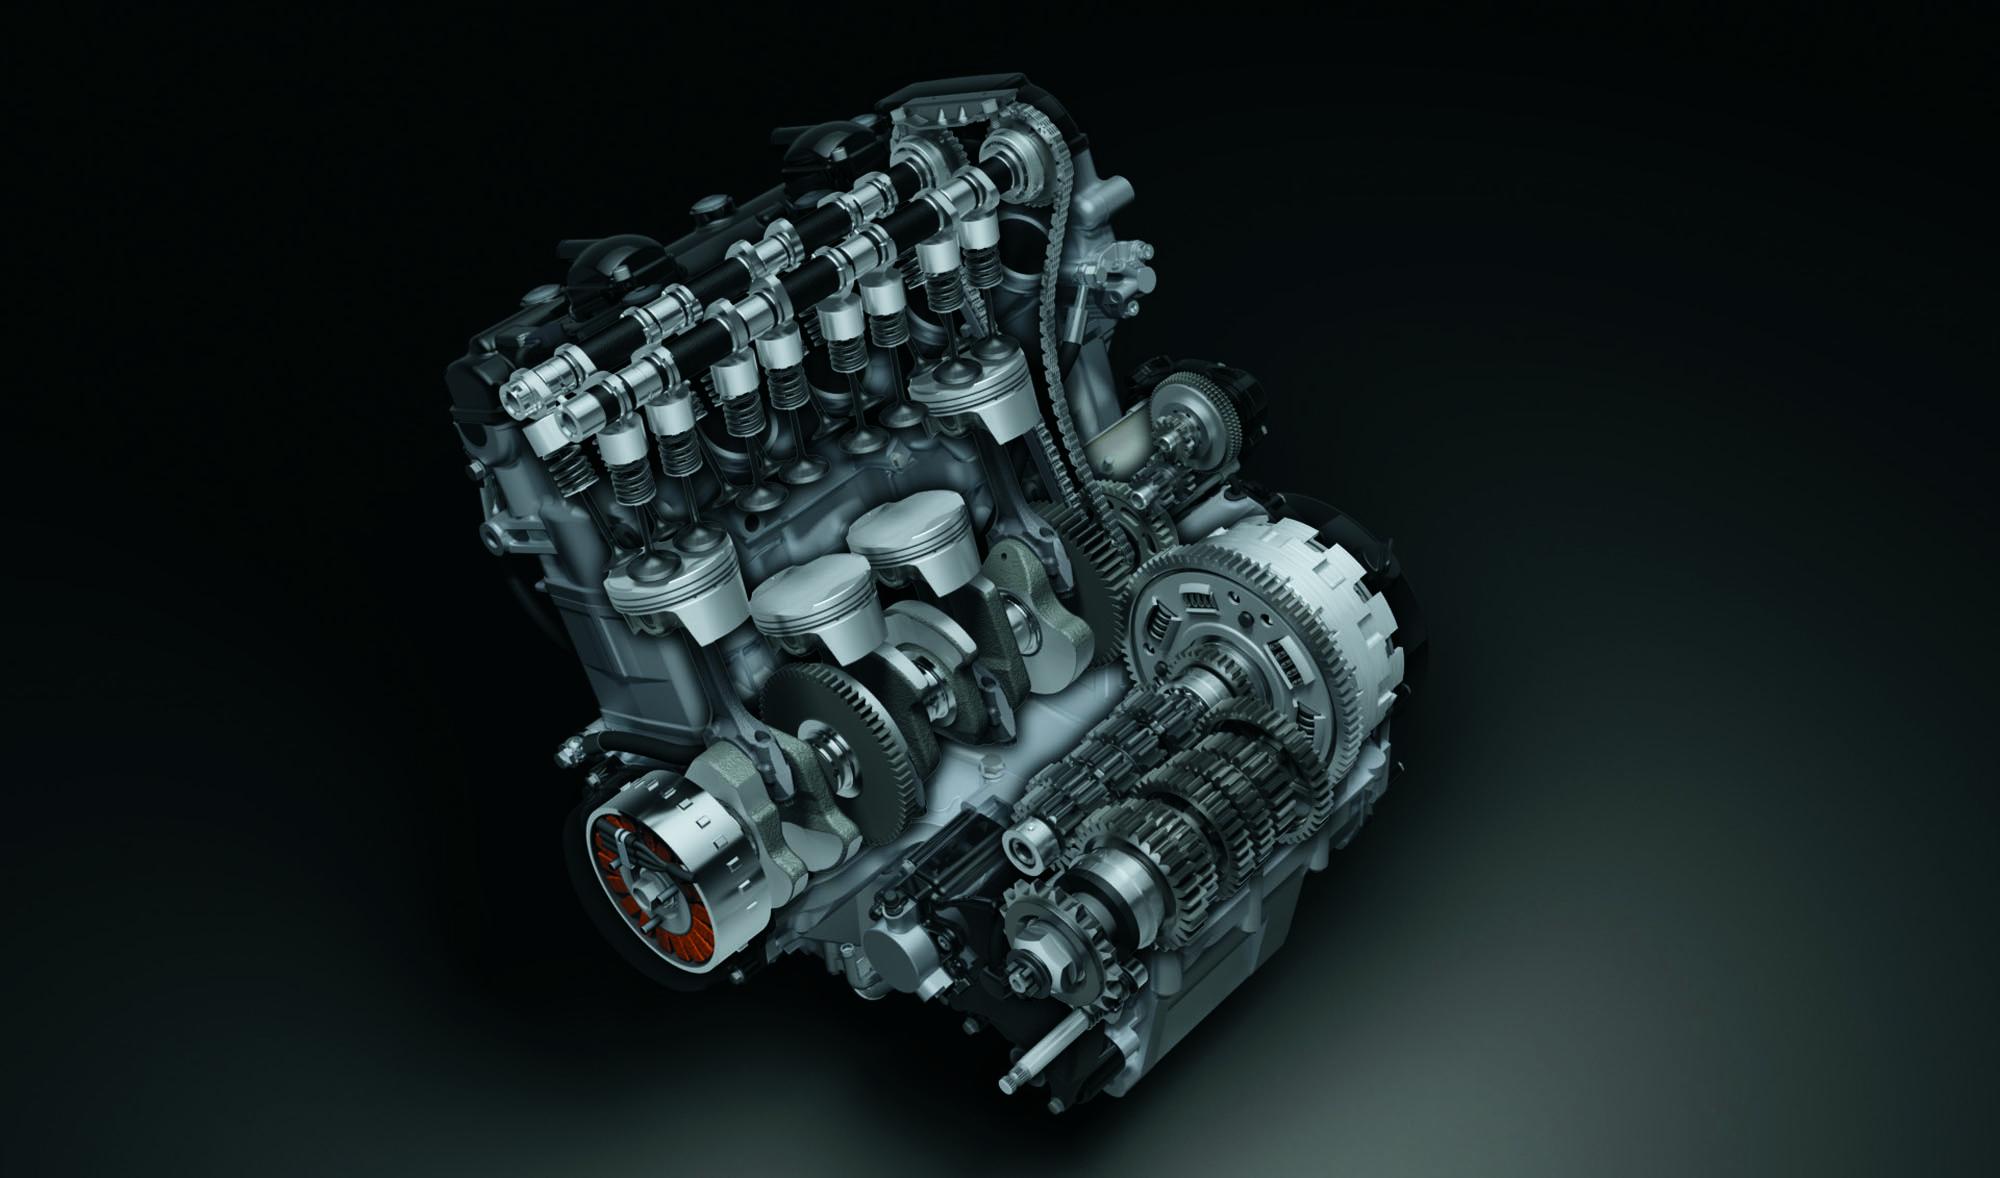 2019 Hayabusa DOHC 1340cm3 Engine